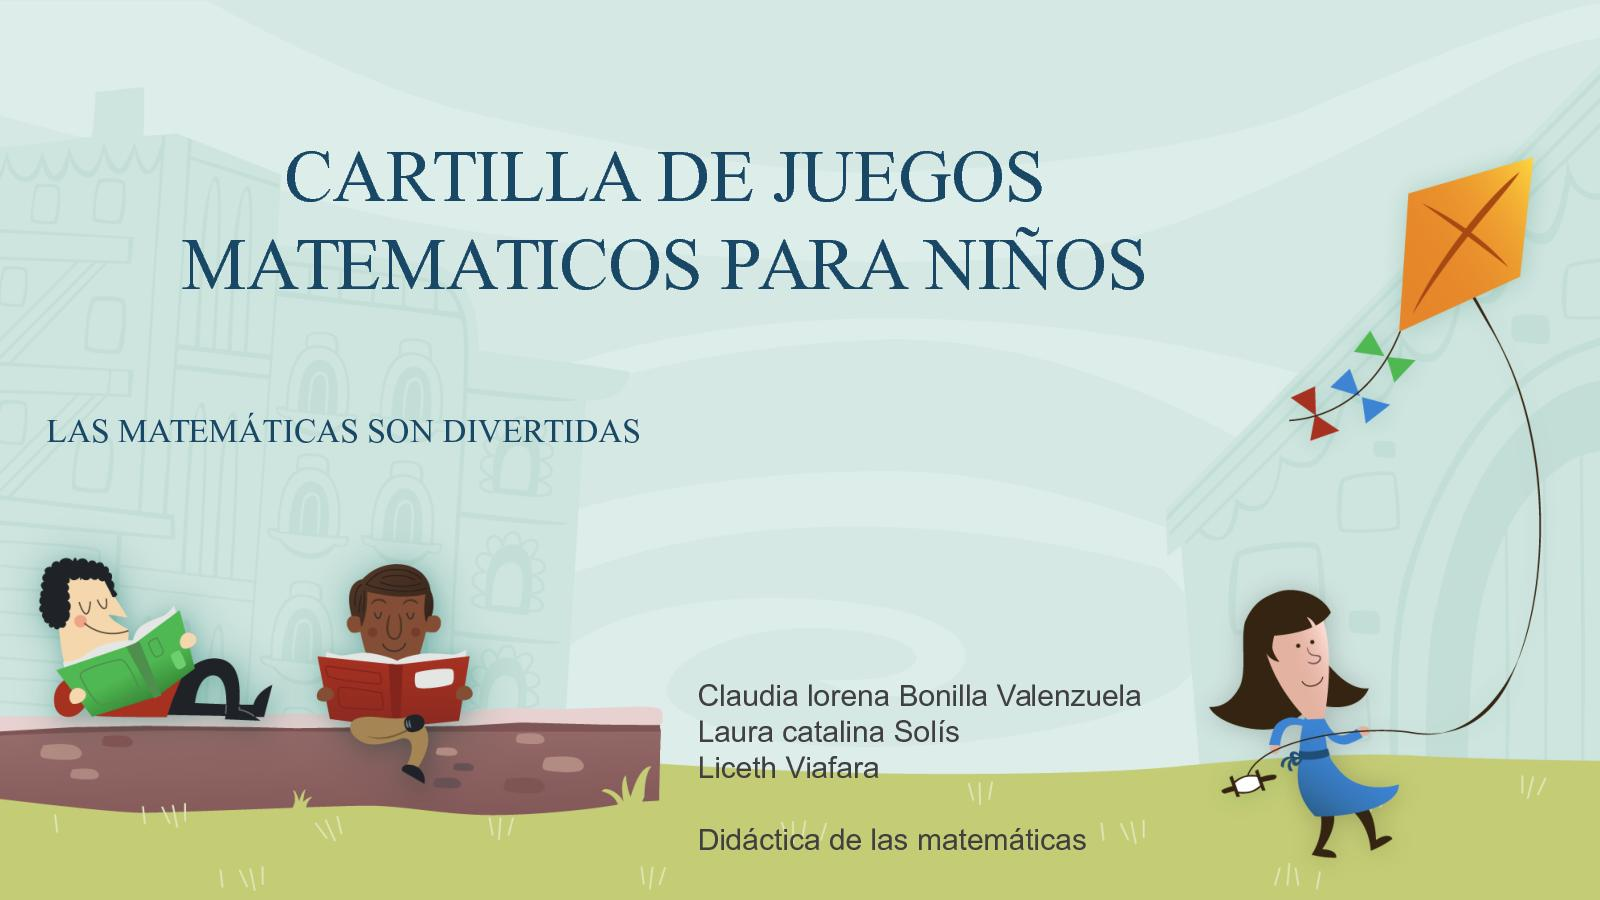 Calameo Cartilla De Juegos Matematicos Para Ninos